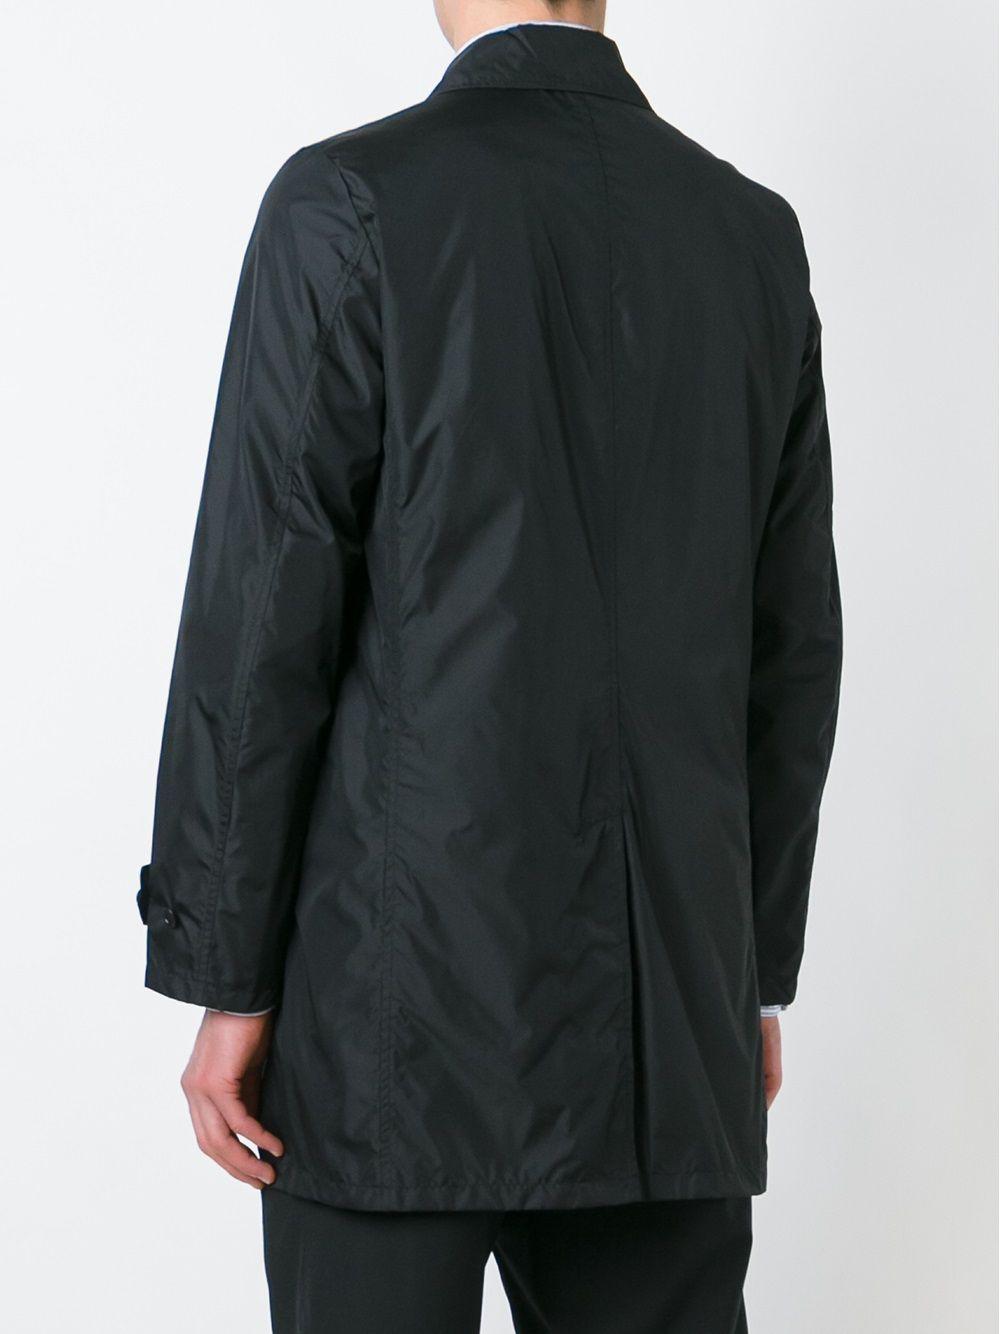 Aspesi impermeable jacket man black ASPESI | Jackets | I236 795485241